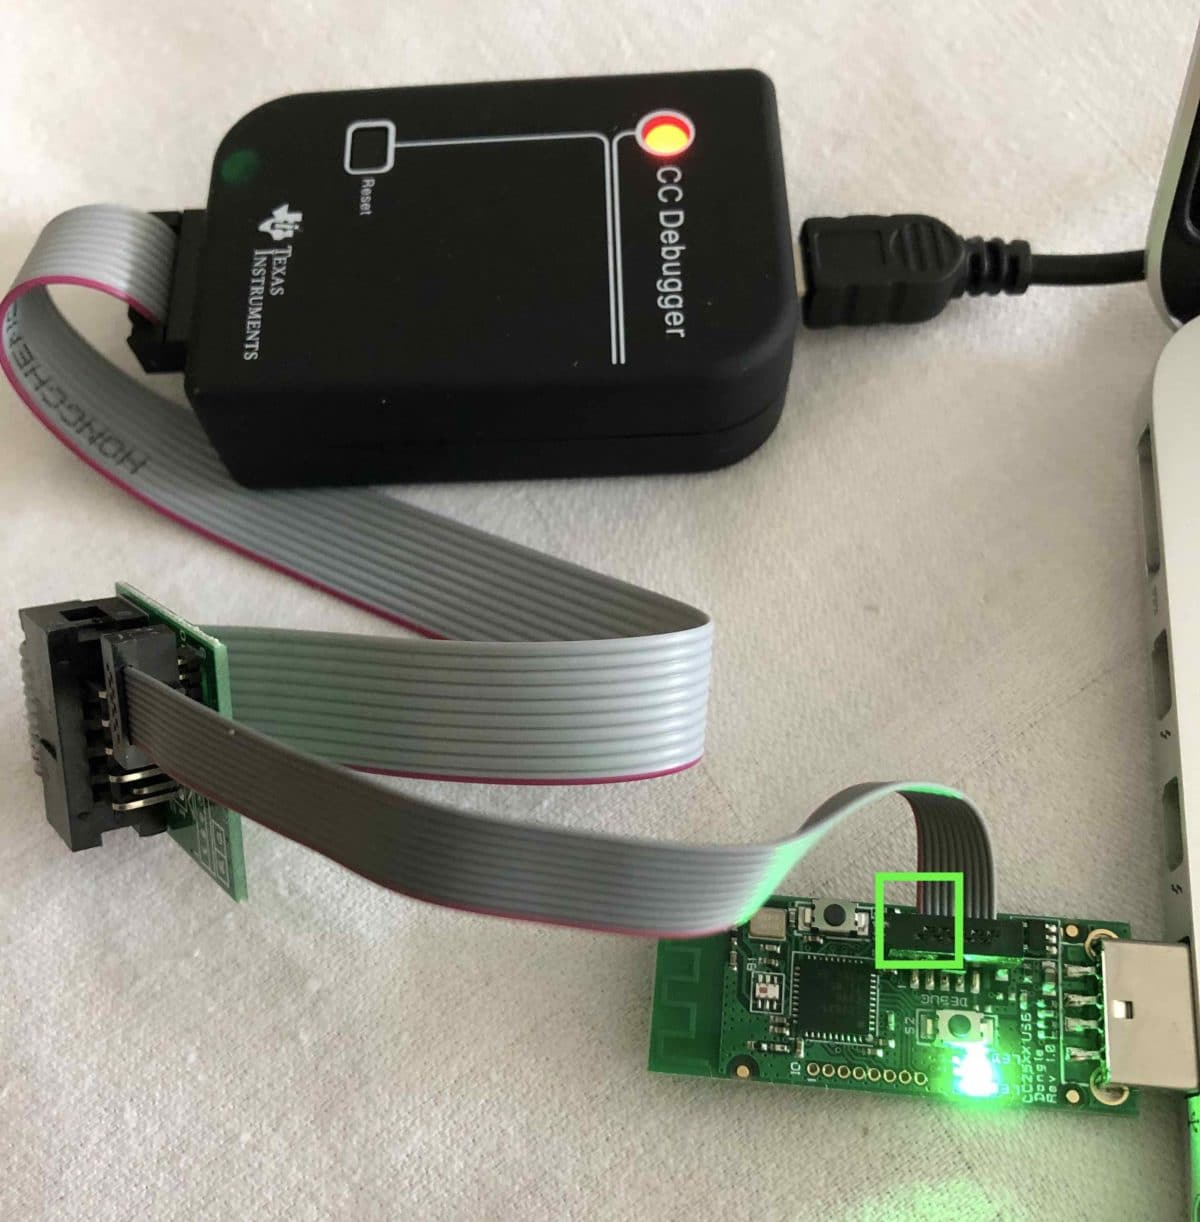 CC2531 flashen – für zigbee2mqtt | Smart Home Assistant